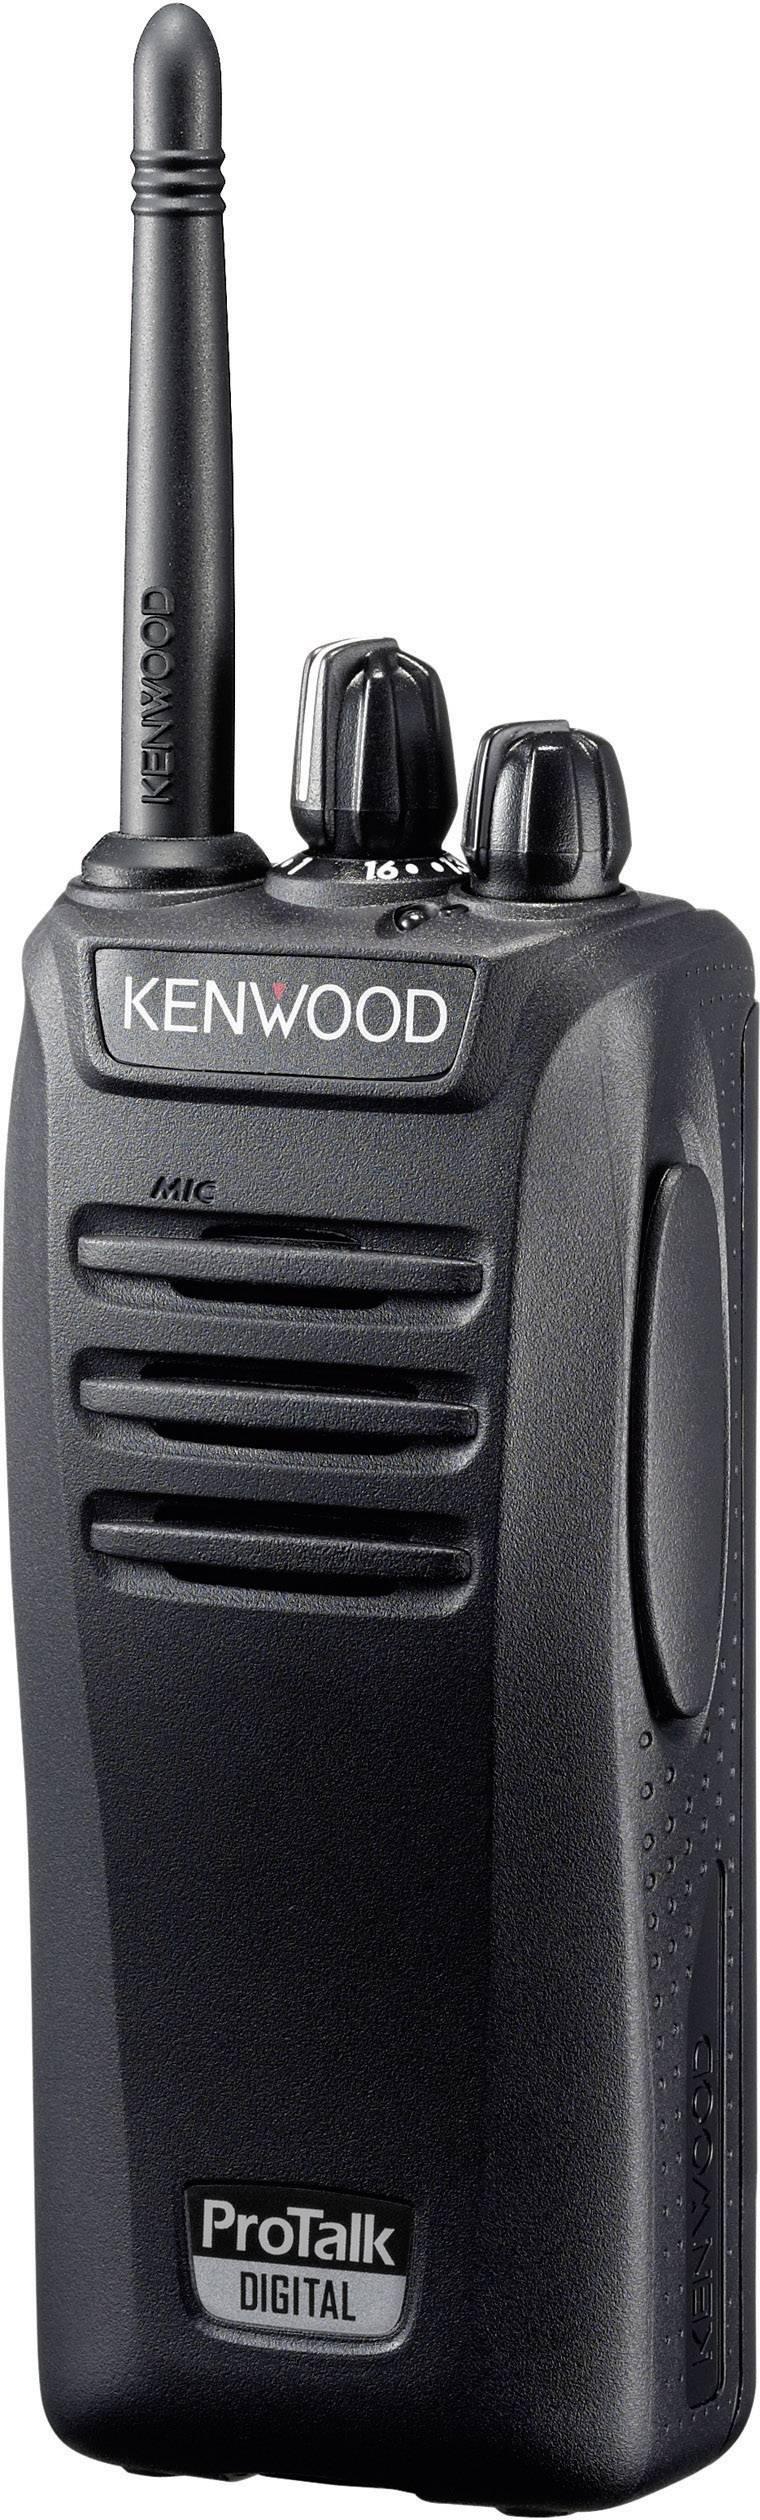 PMR a dPMR radiostanice Kenwood ProTalk TK-3401DE